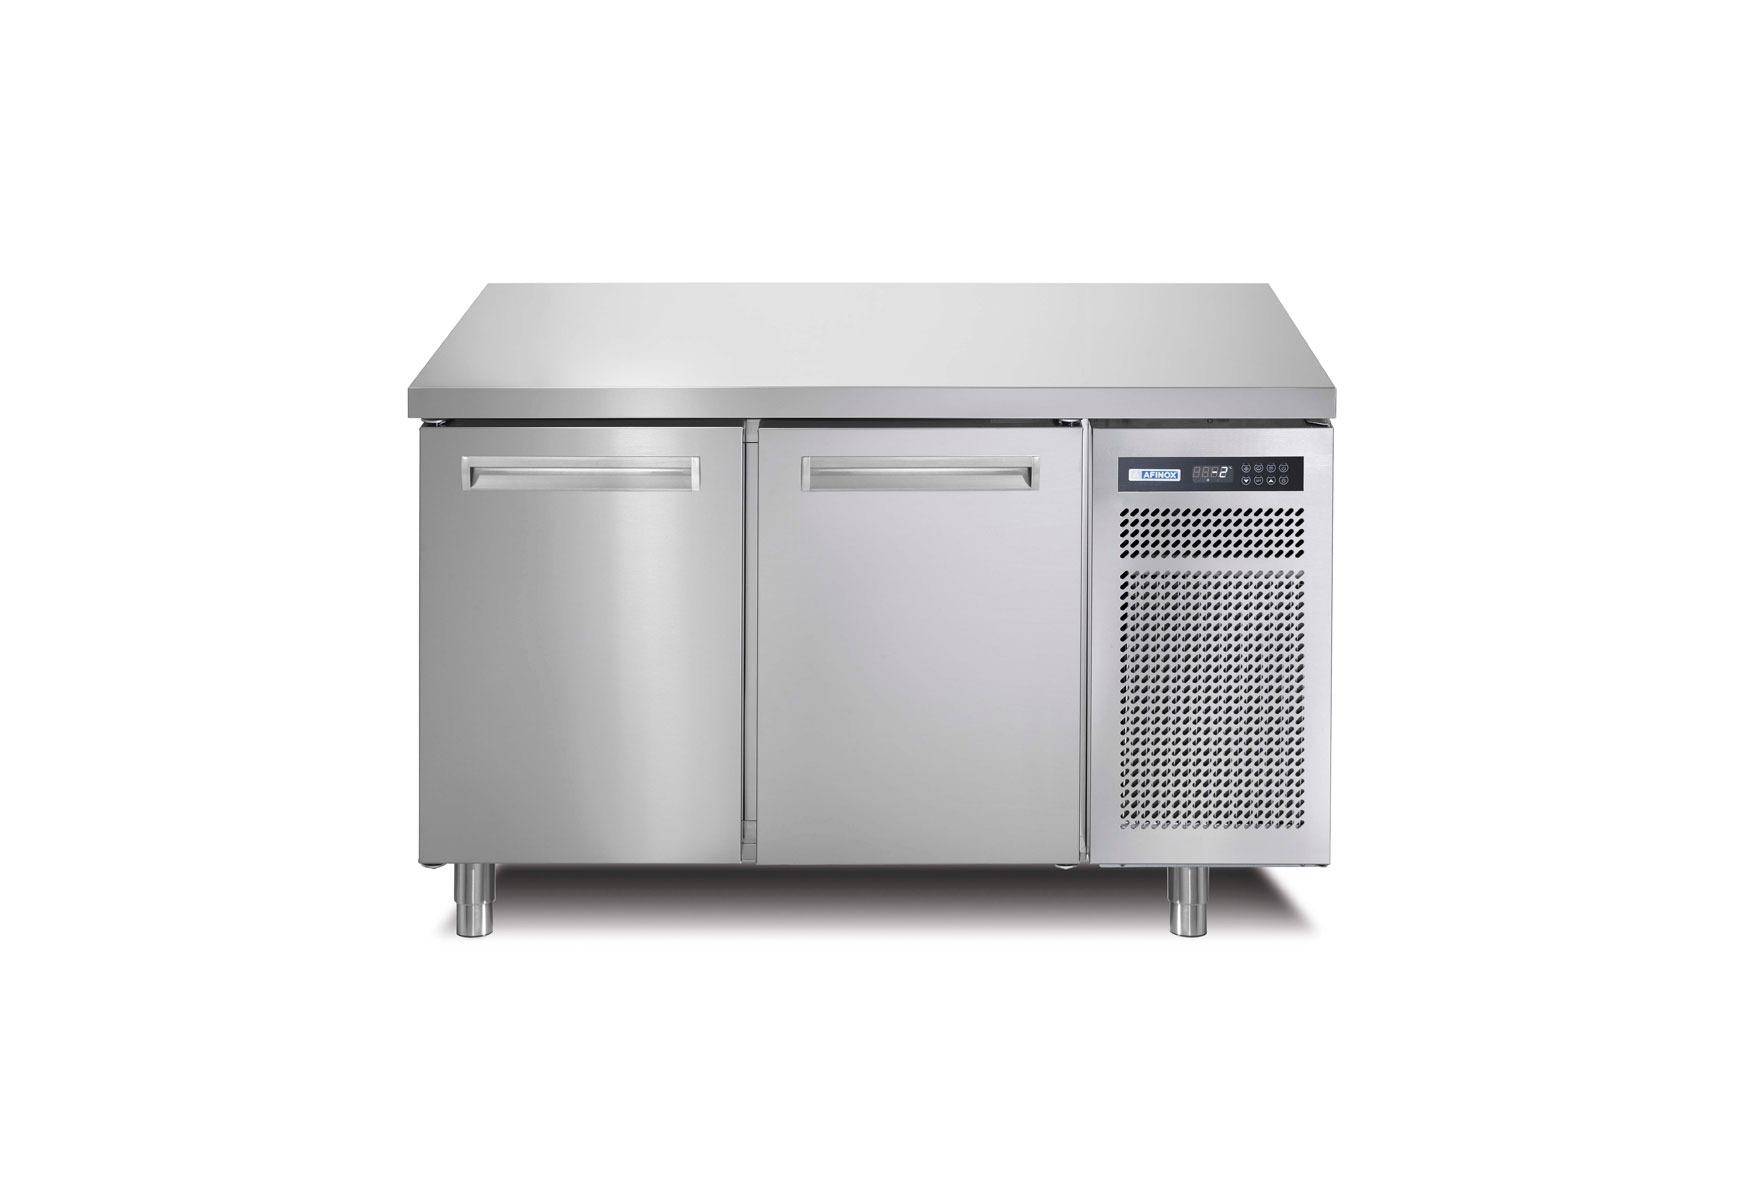 SPRING, tavoli refrigerati ventilati